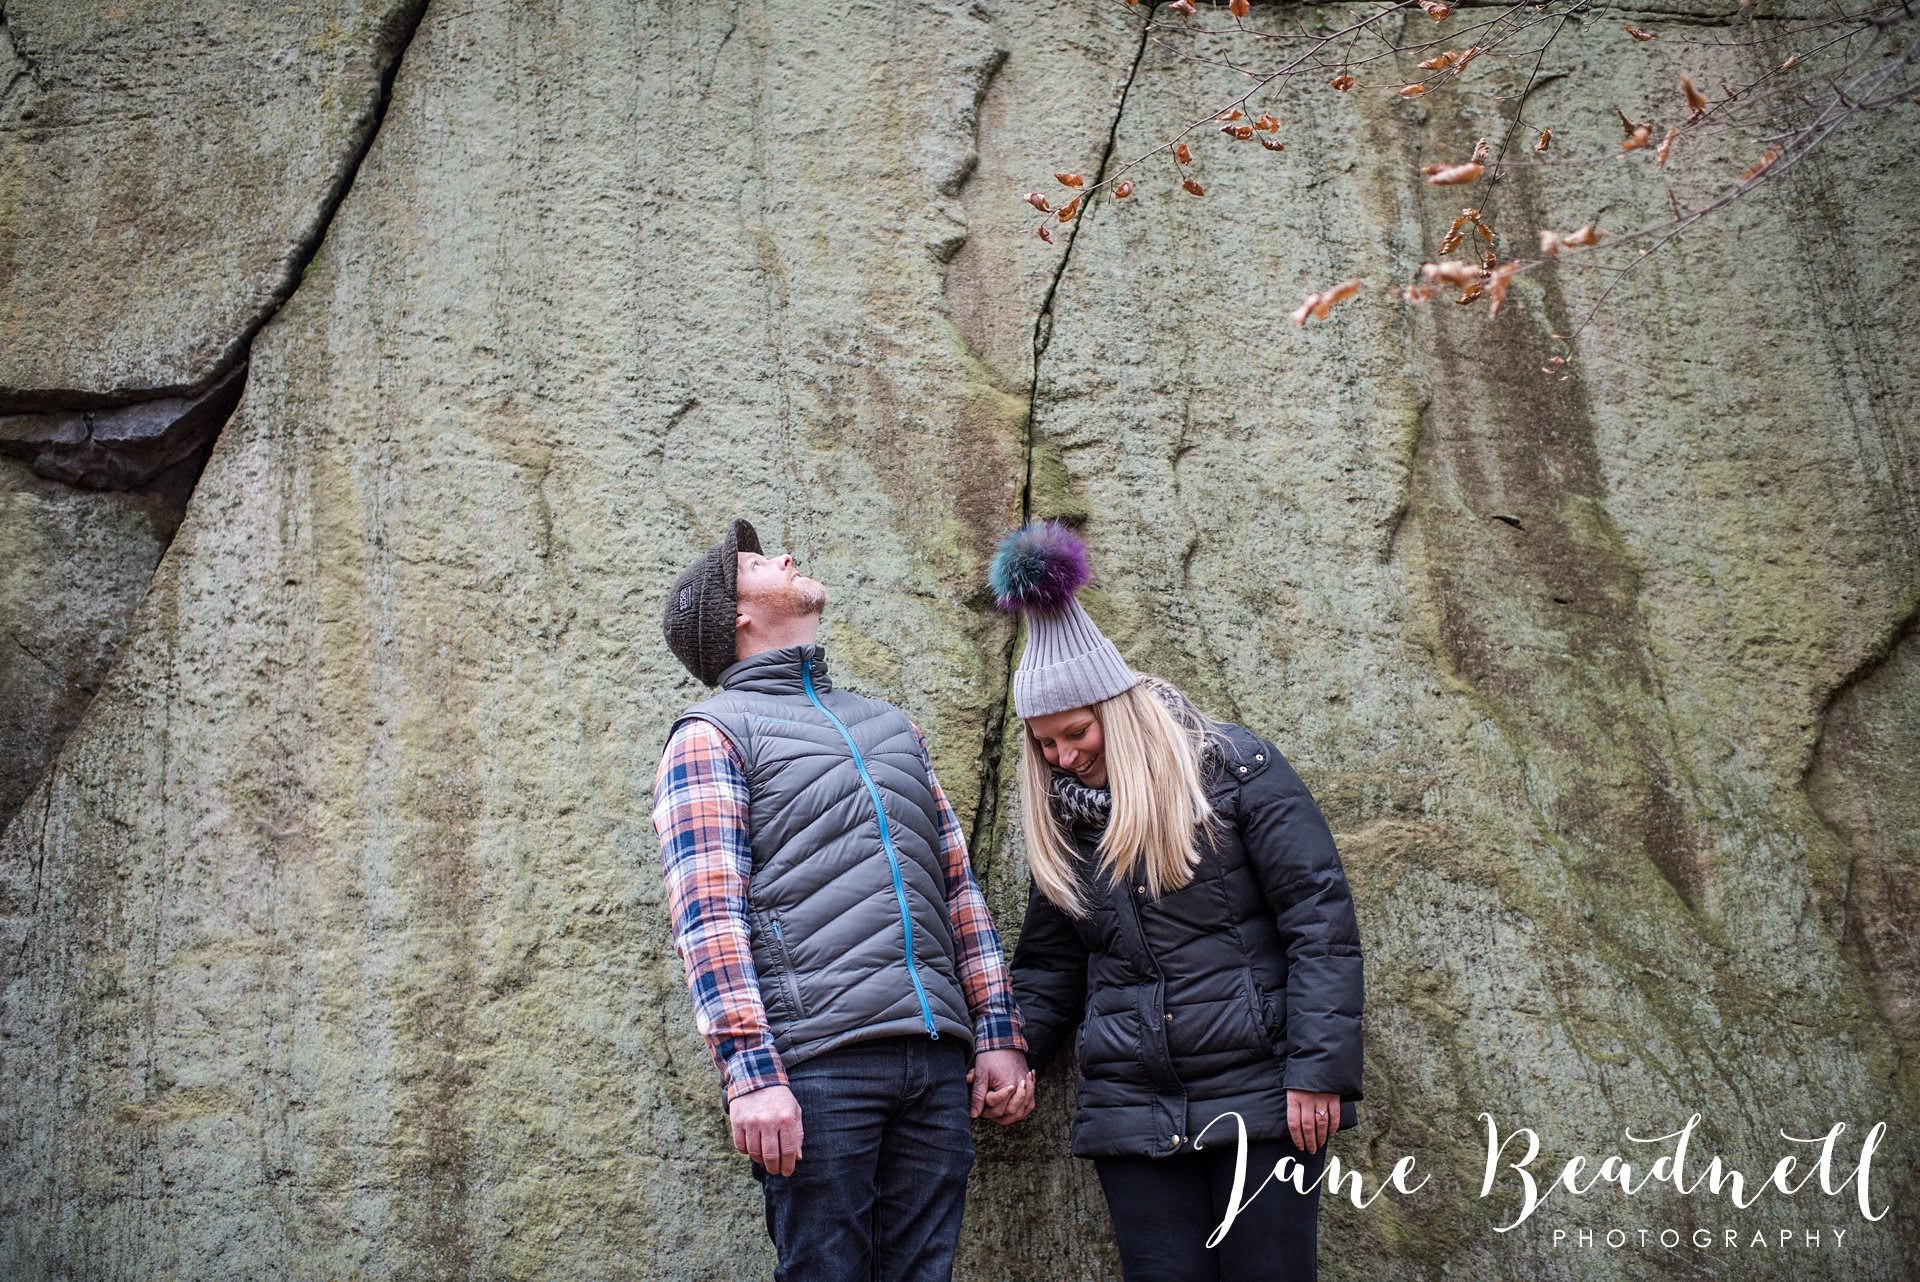 yorkshire-wedding-photographer-jane-beadnell-photography-uk-and-destination-wedding-photographer-engagement-shoot_0057